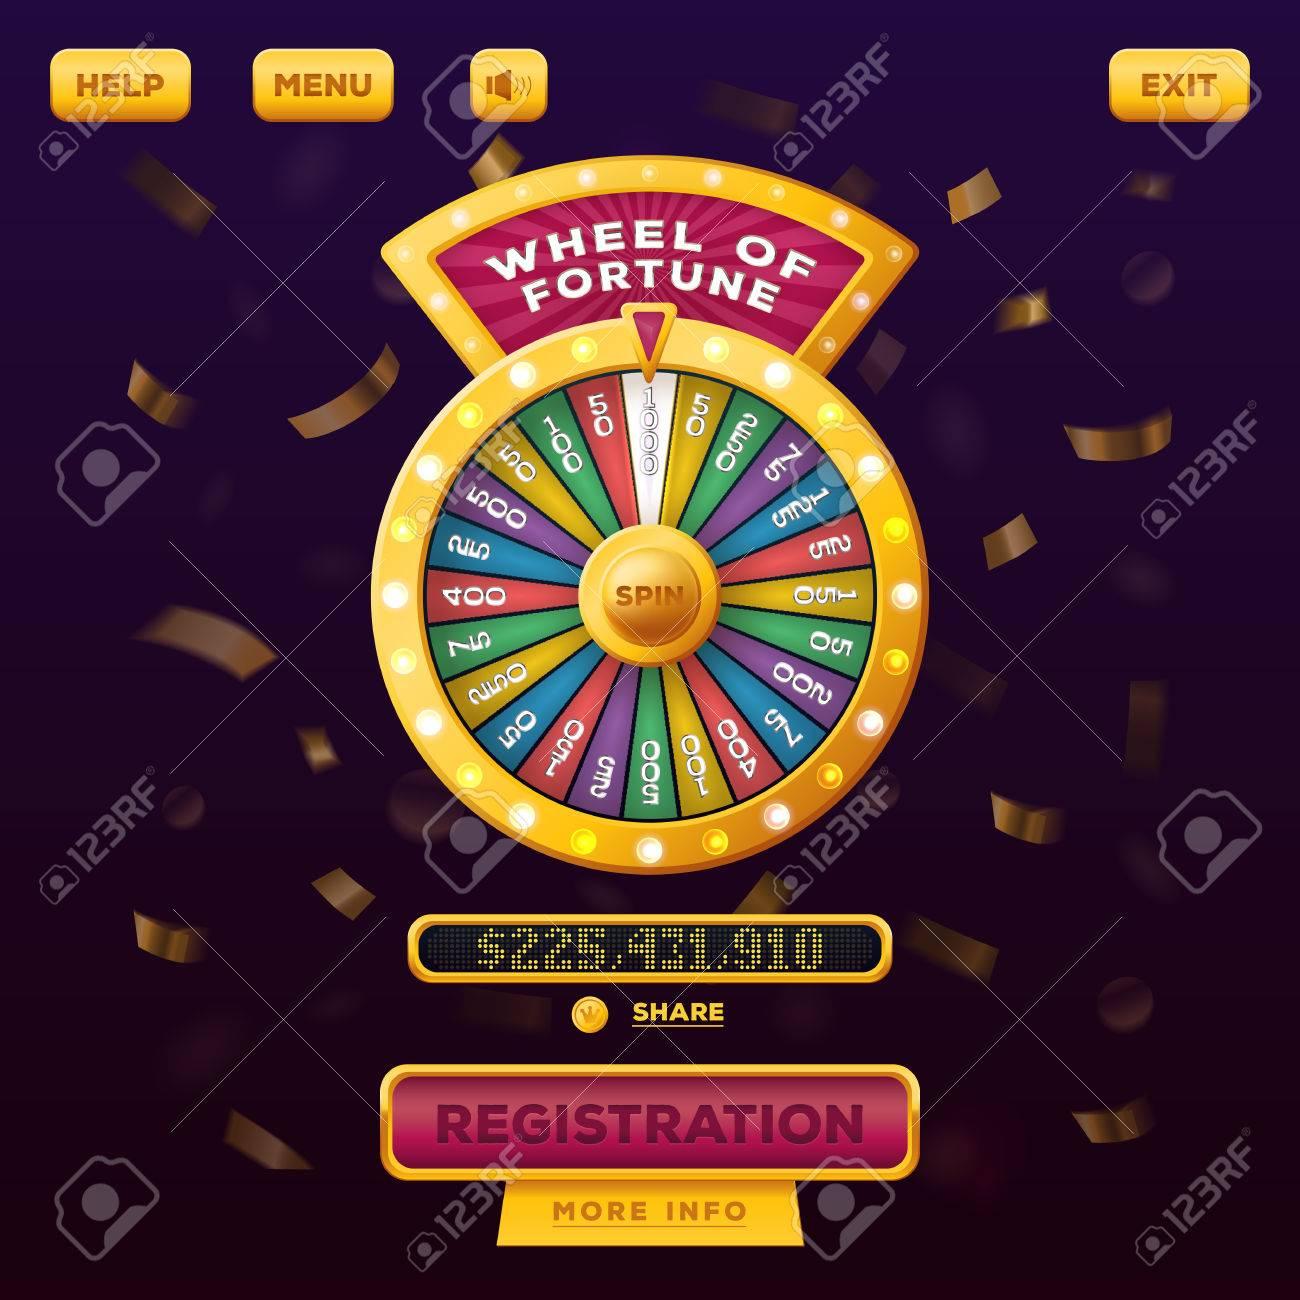 Casino menu web design with wheel of fortune - 70792863